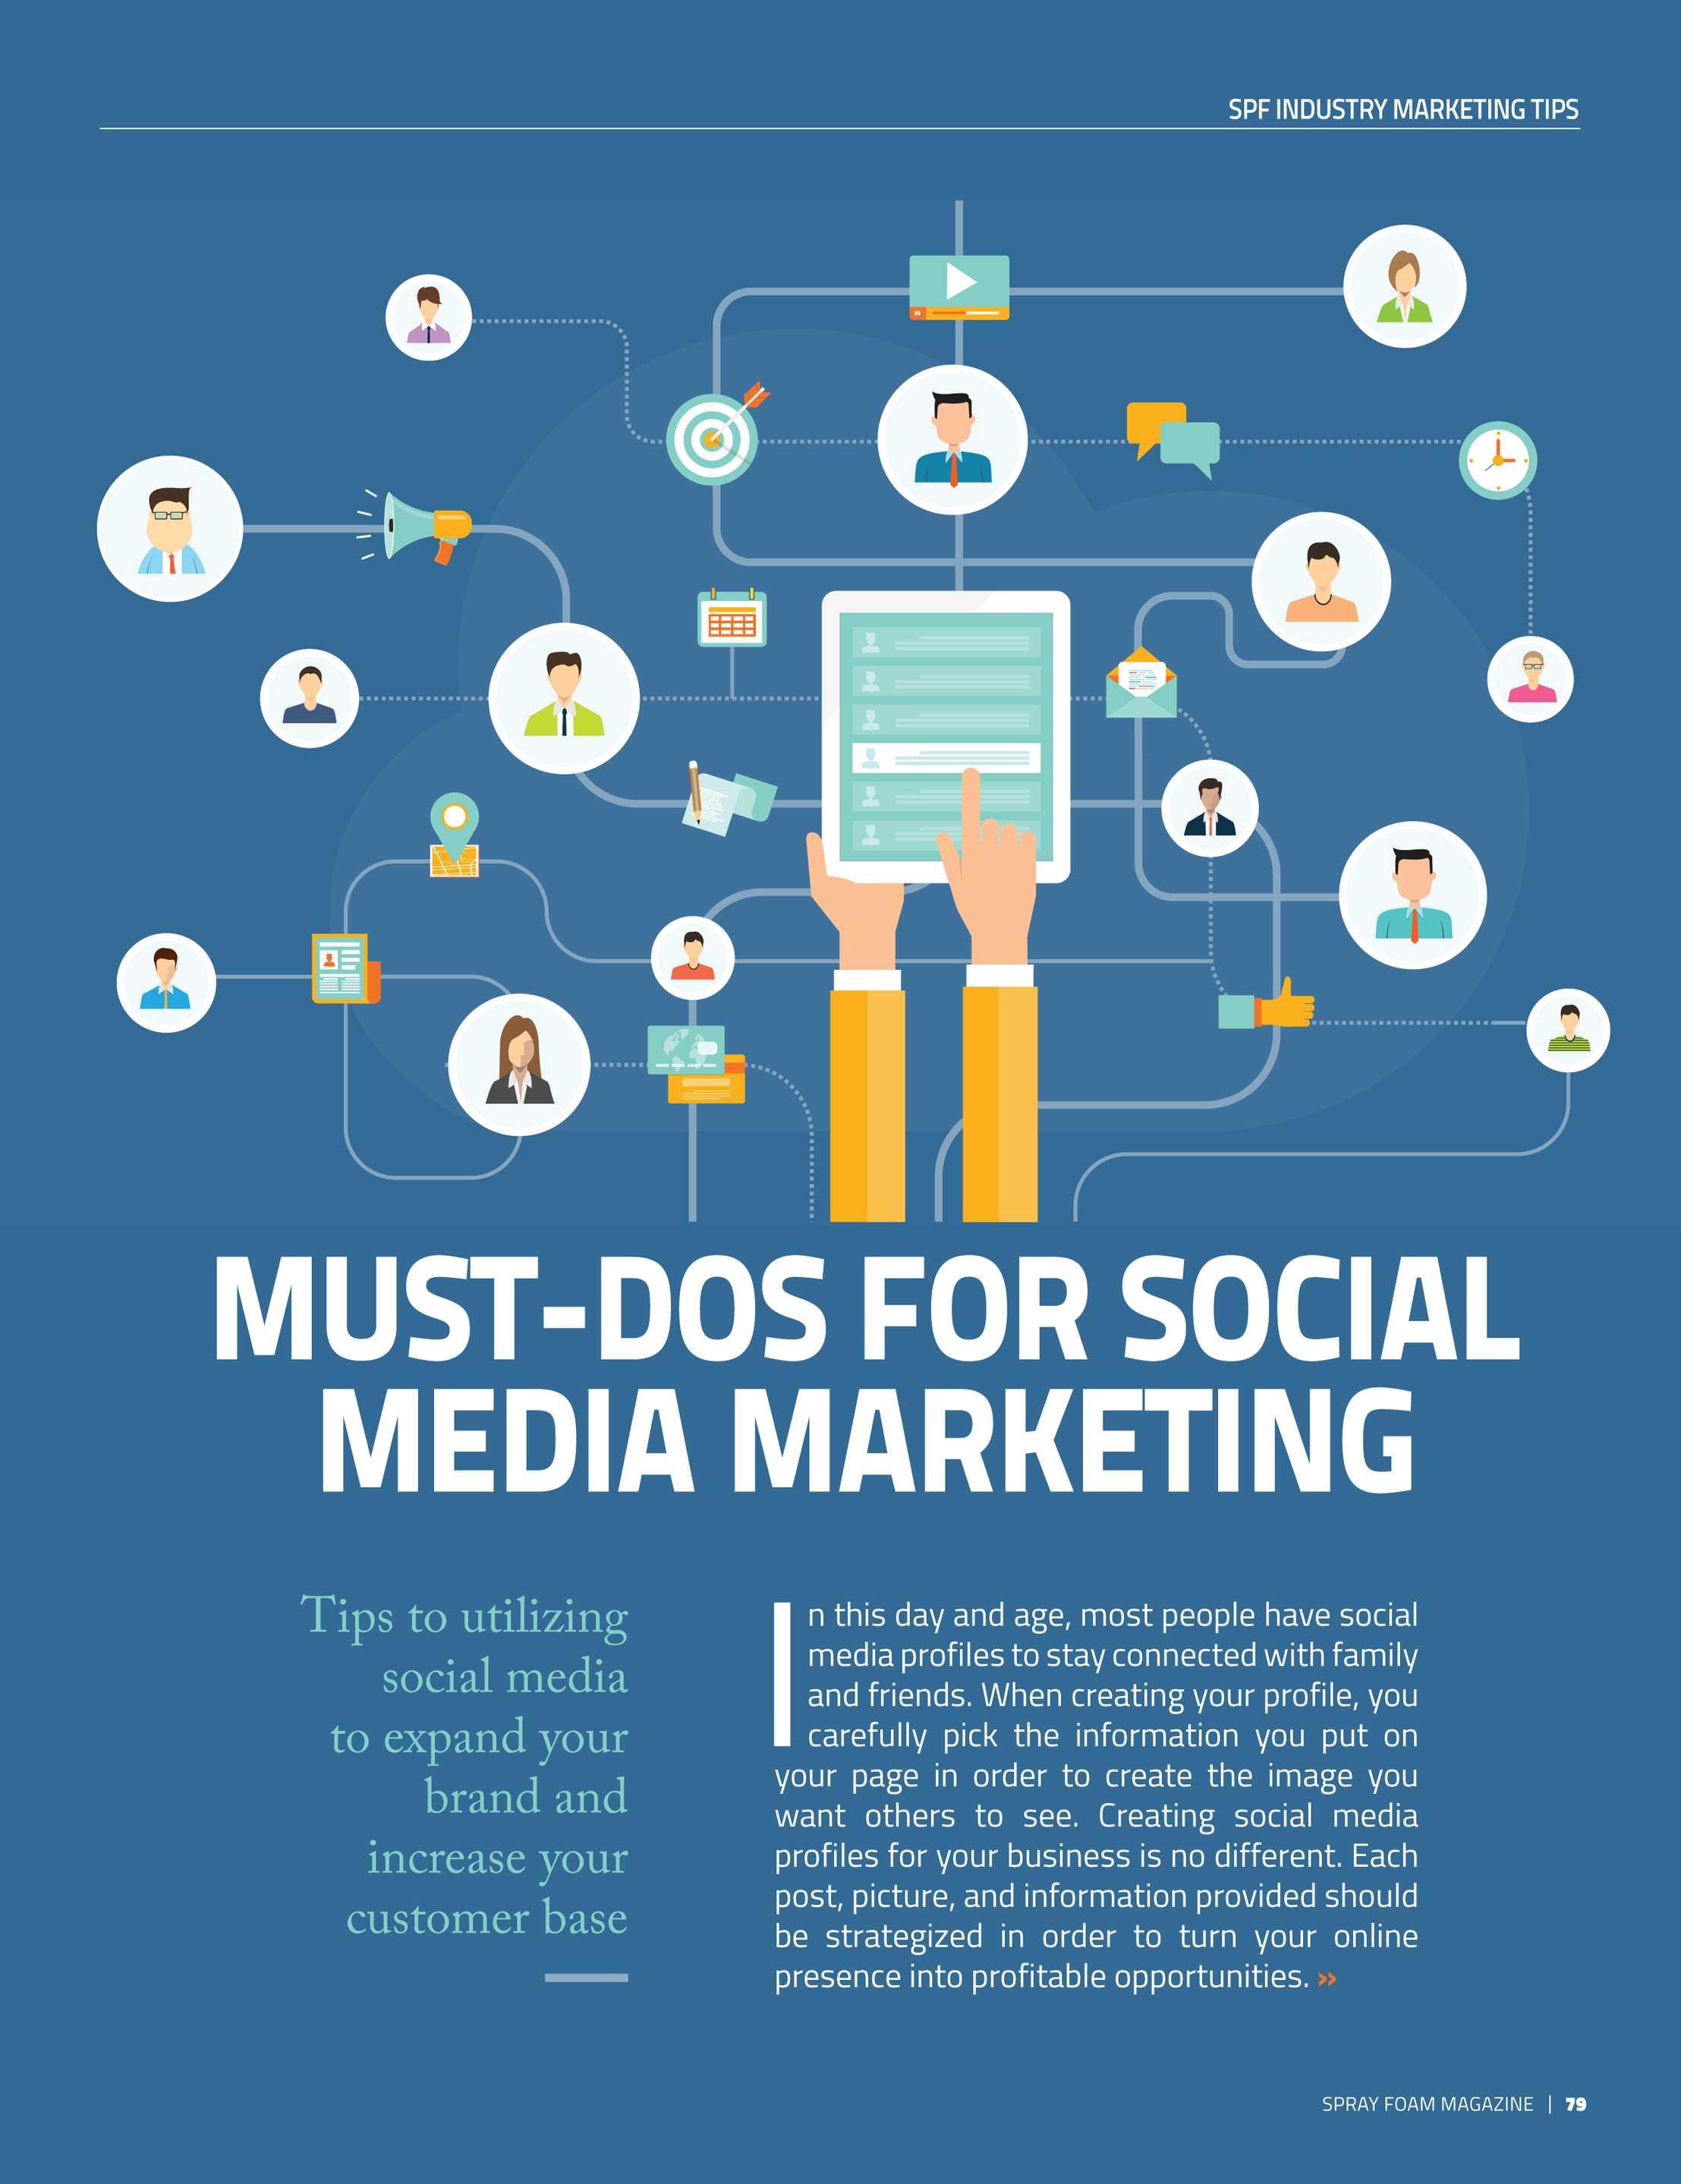 Families Turn To Social Media With >> Spray Foam Magazine Janfeb2018 Page 79